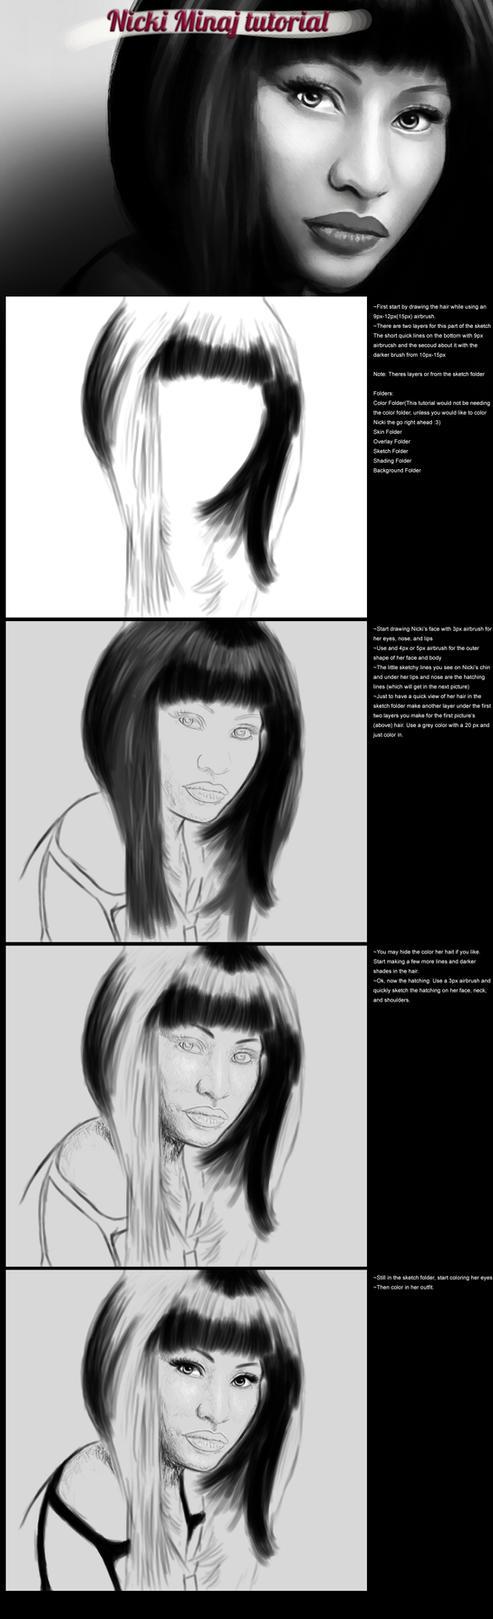 Nicki Minaj tutorial part 1 by secretSWC